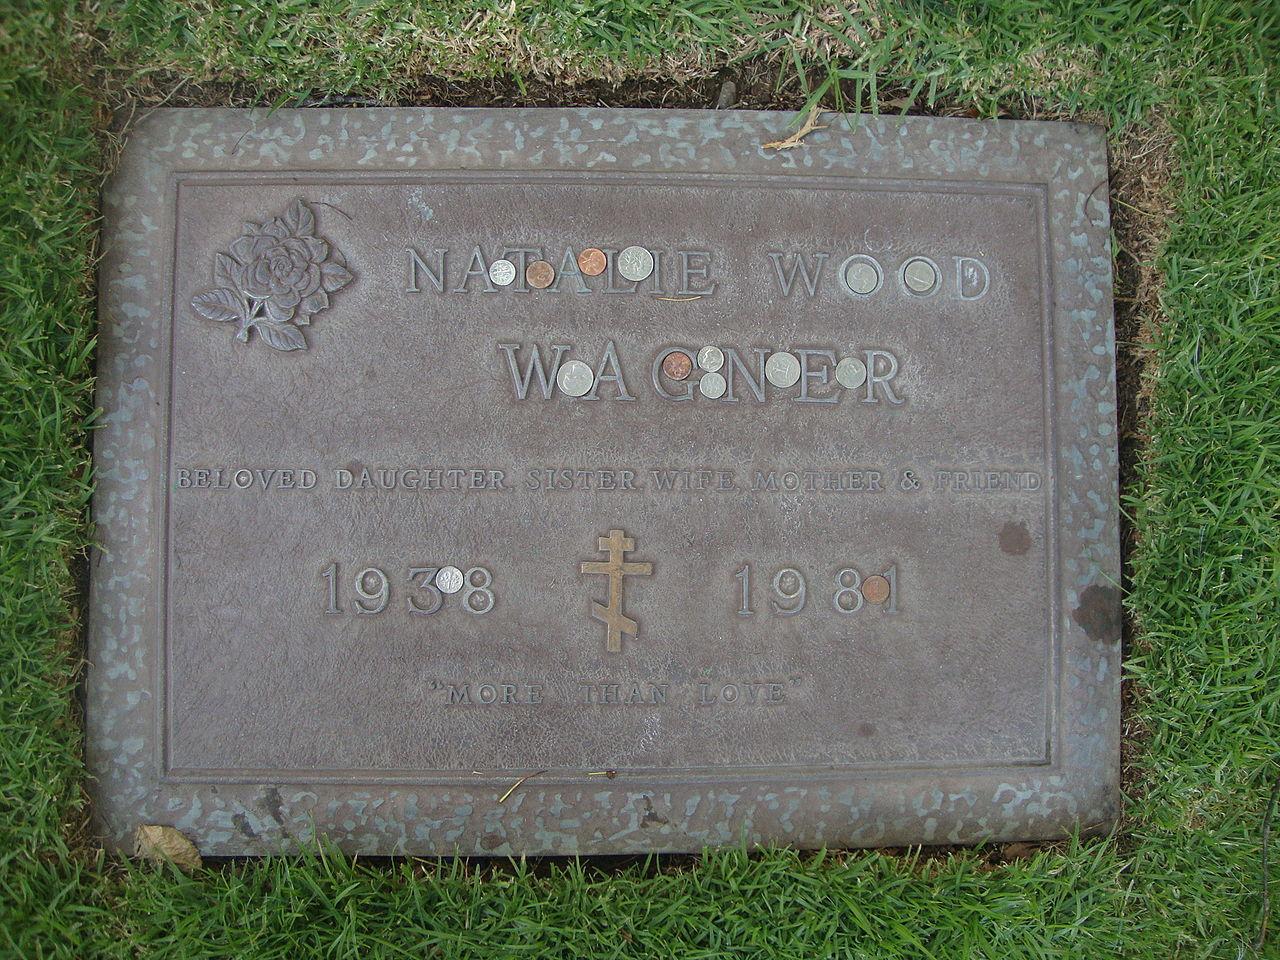 1280px-Natalie_Wood's_grave.jpg